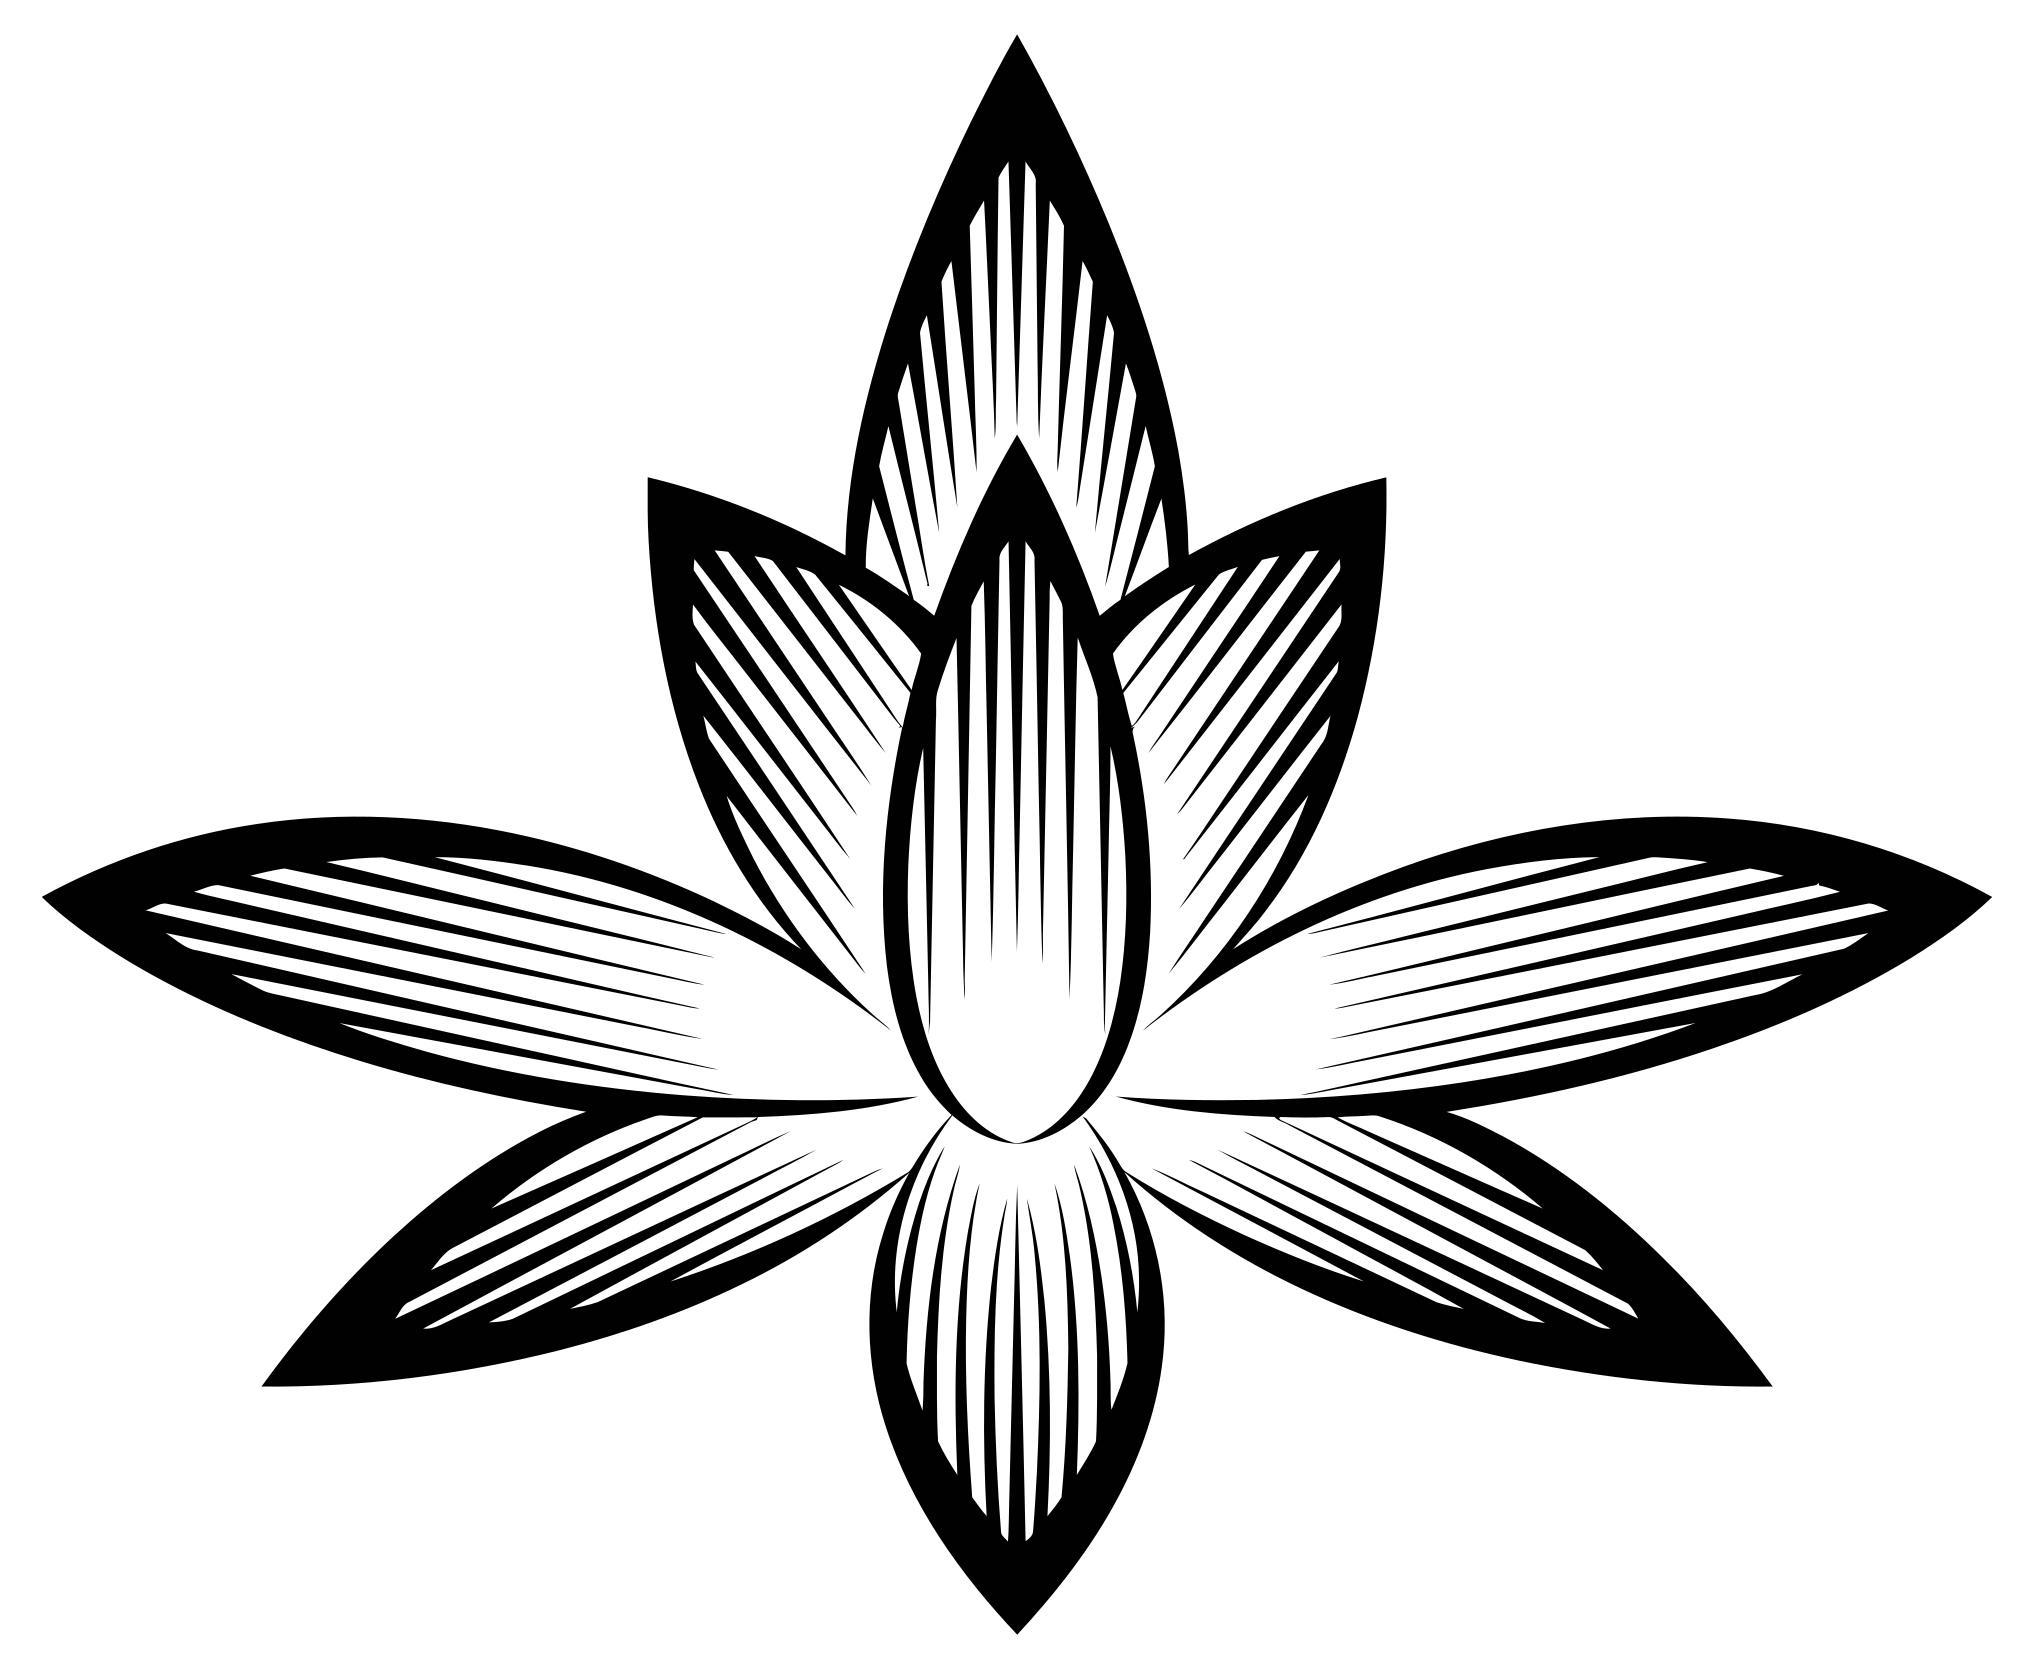 2034x1669 Stylized Flower Silhouette Clipart